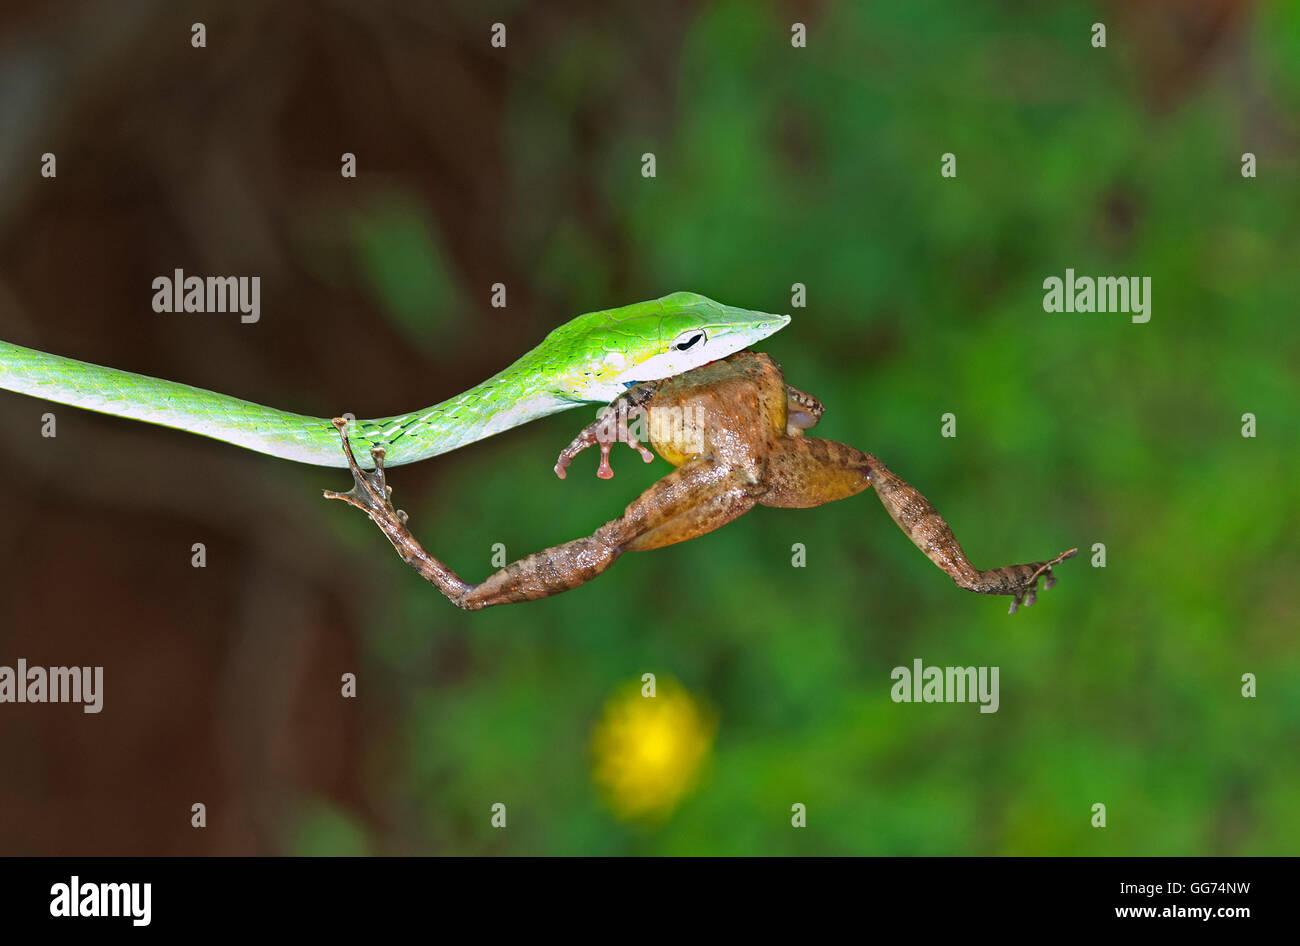 La imagen de verde Serpiente Hierophis viridiflavus látigo() con frog matar a matheran, Mumbai, India Imagen De Stock